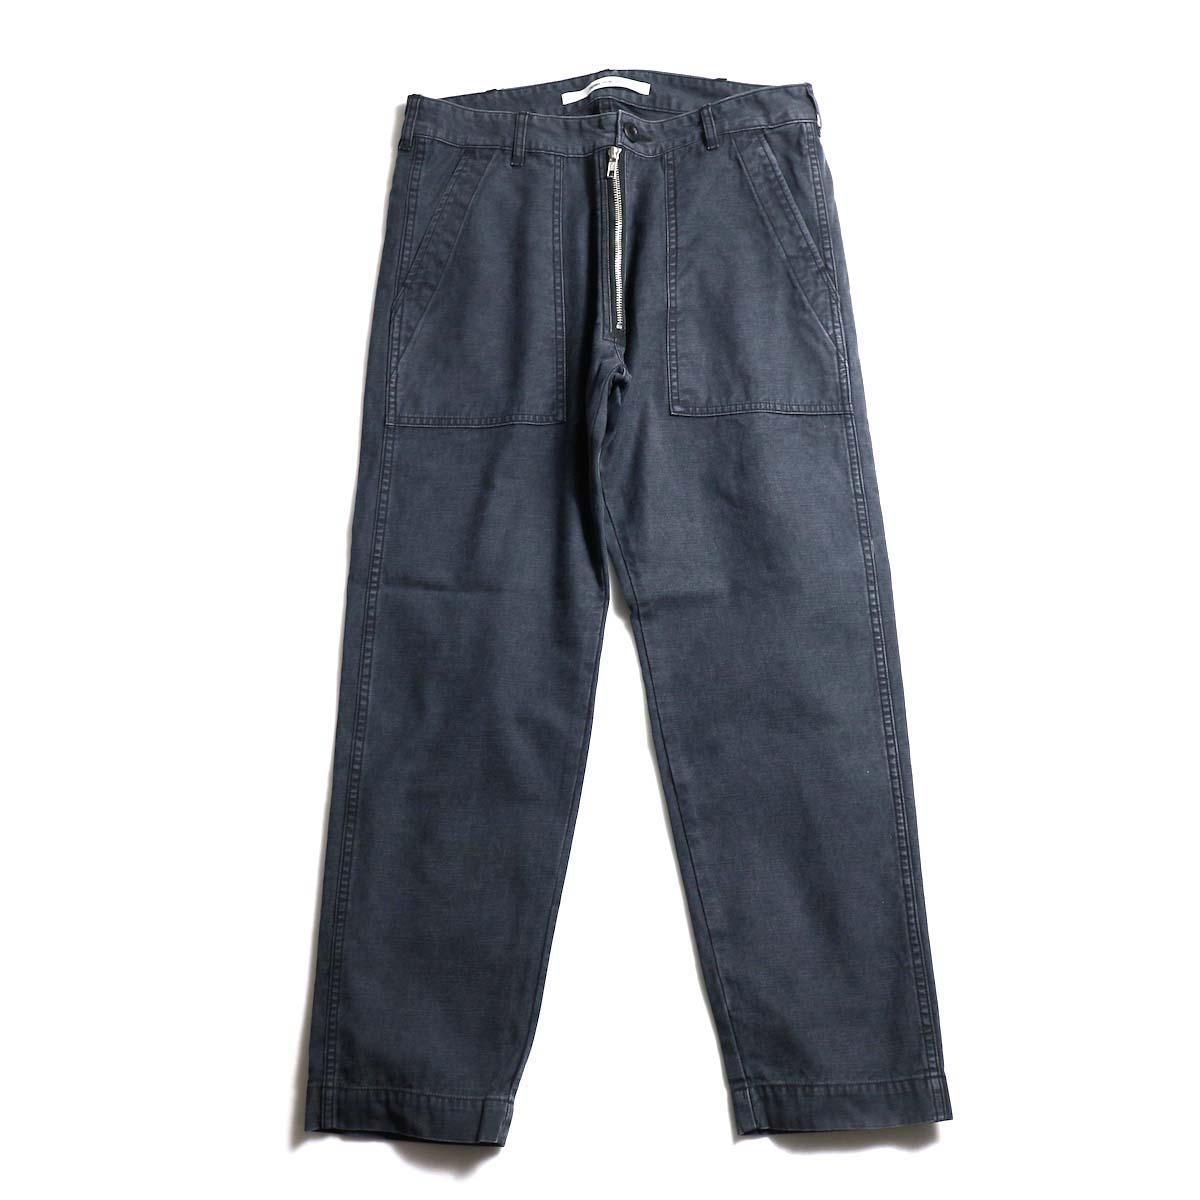 FUTURE PRIMITIVE / FP FZ Baker Pants -BLACK